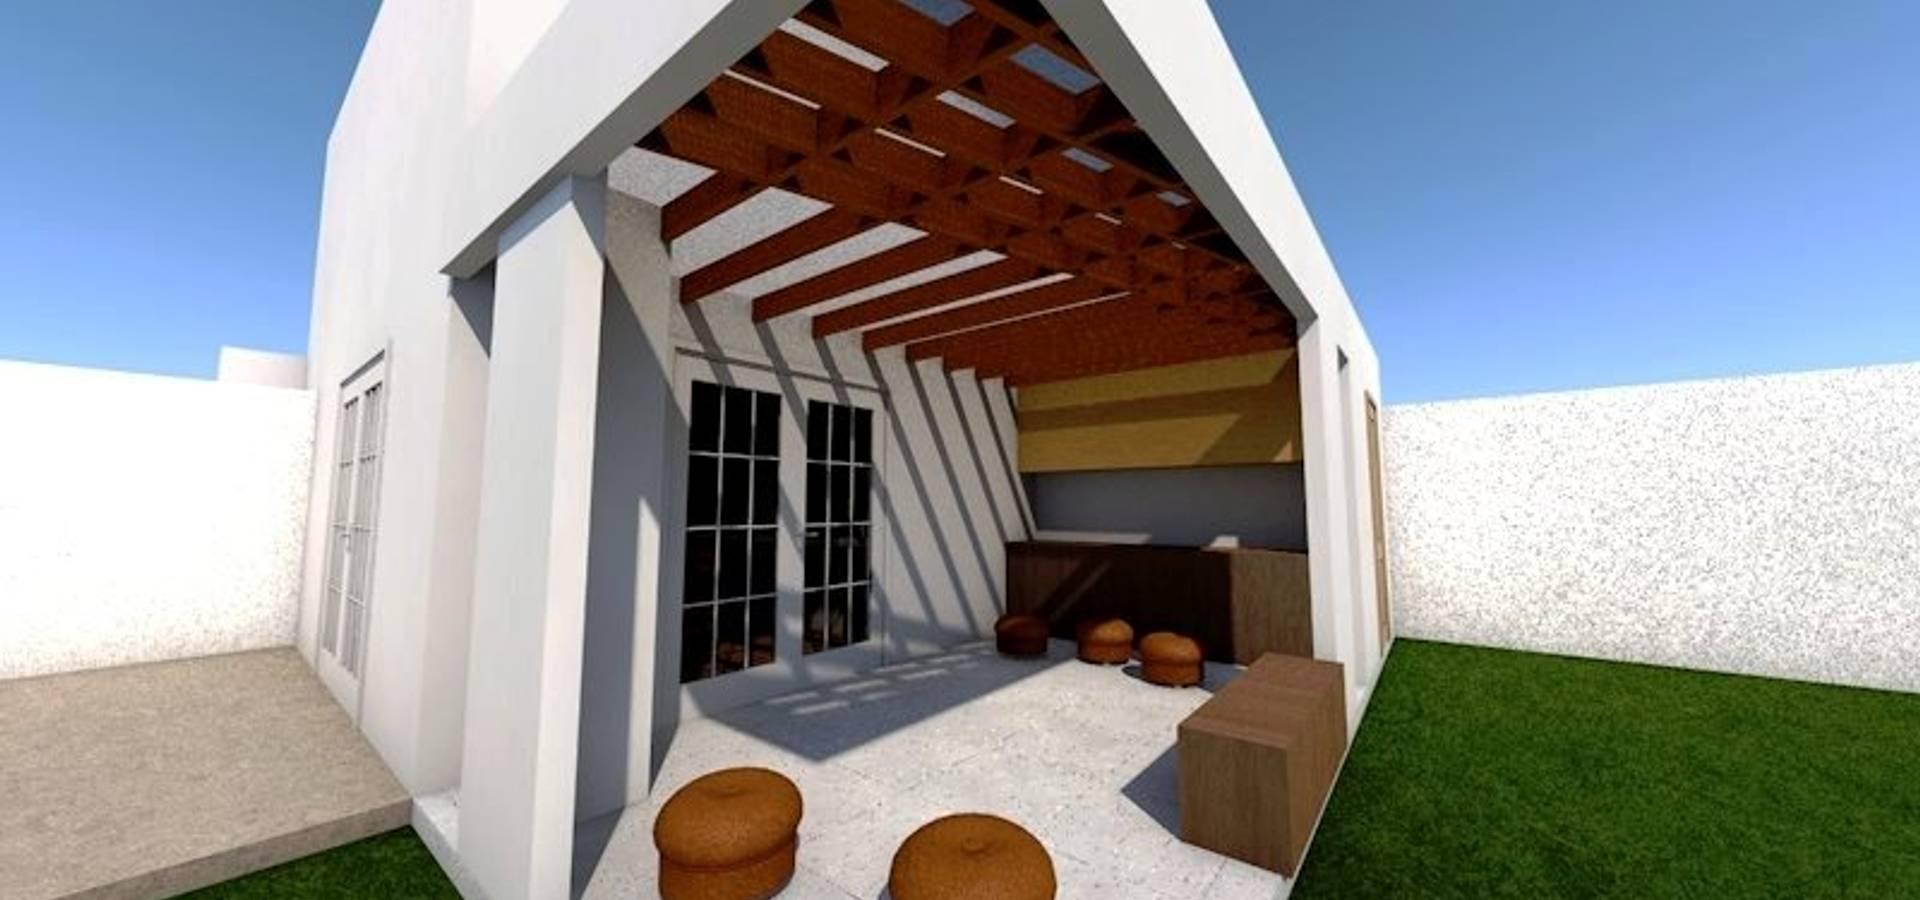 SoLazuL arquitectos